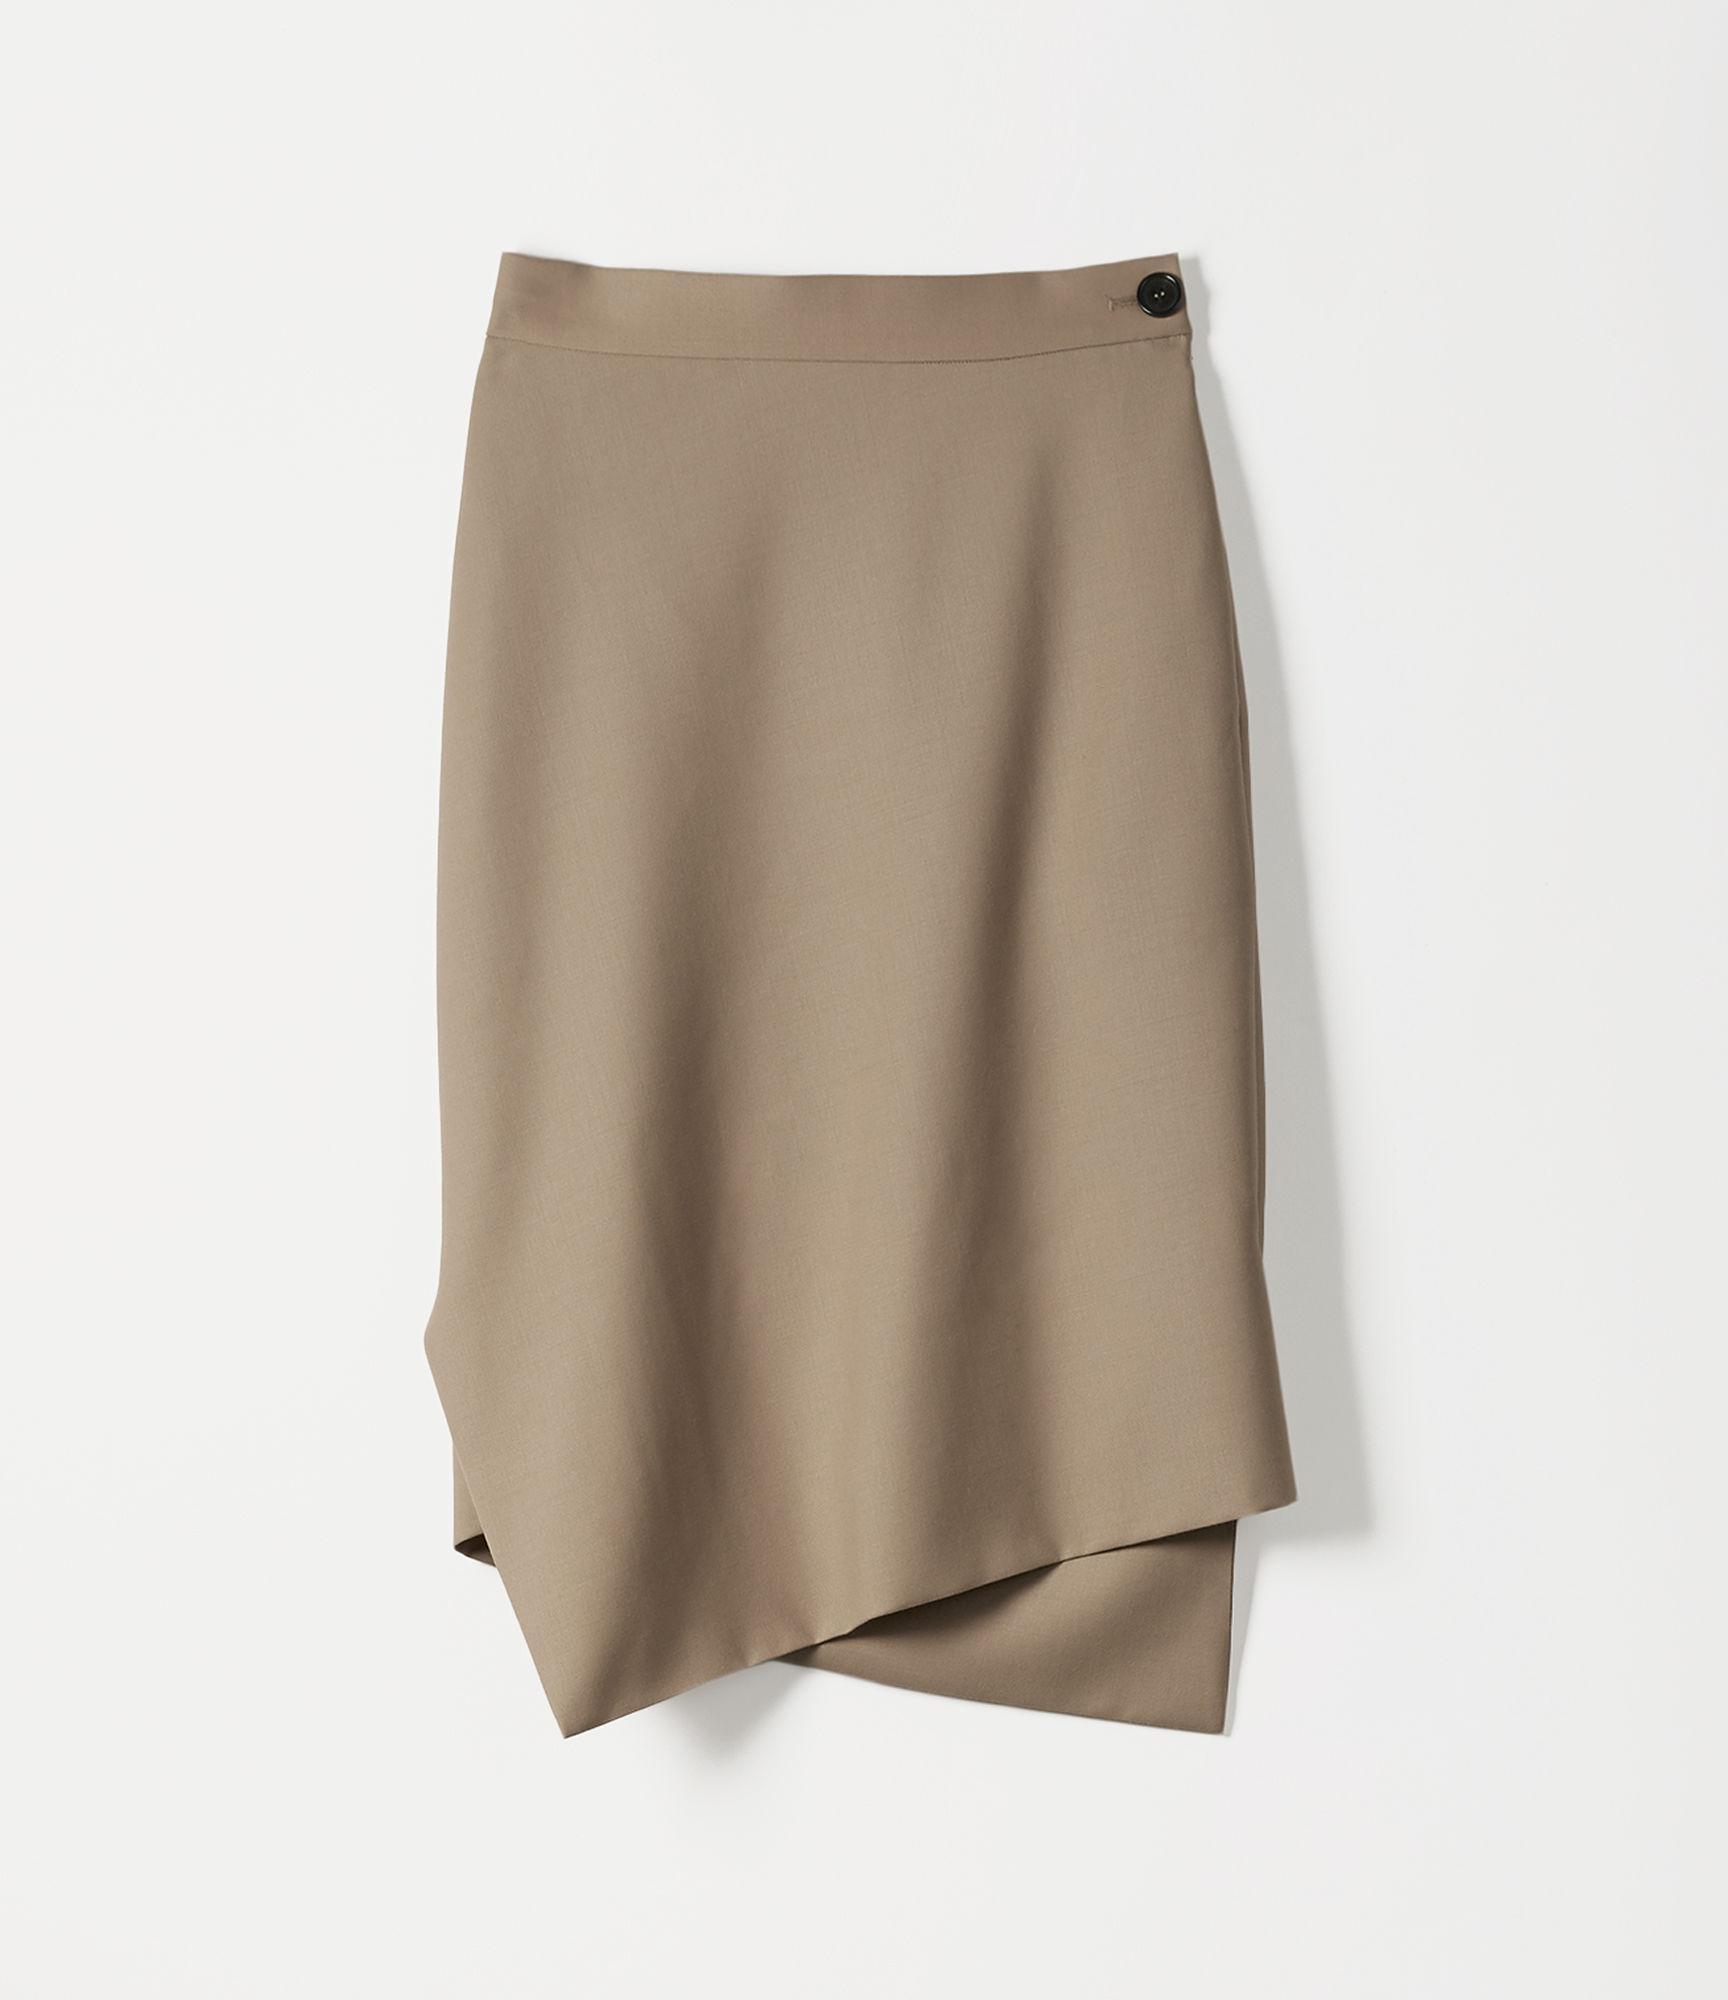 eeffeaf923 Vivienne Westwood Polina Skirt in Natural - Lyst